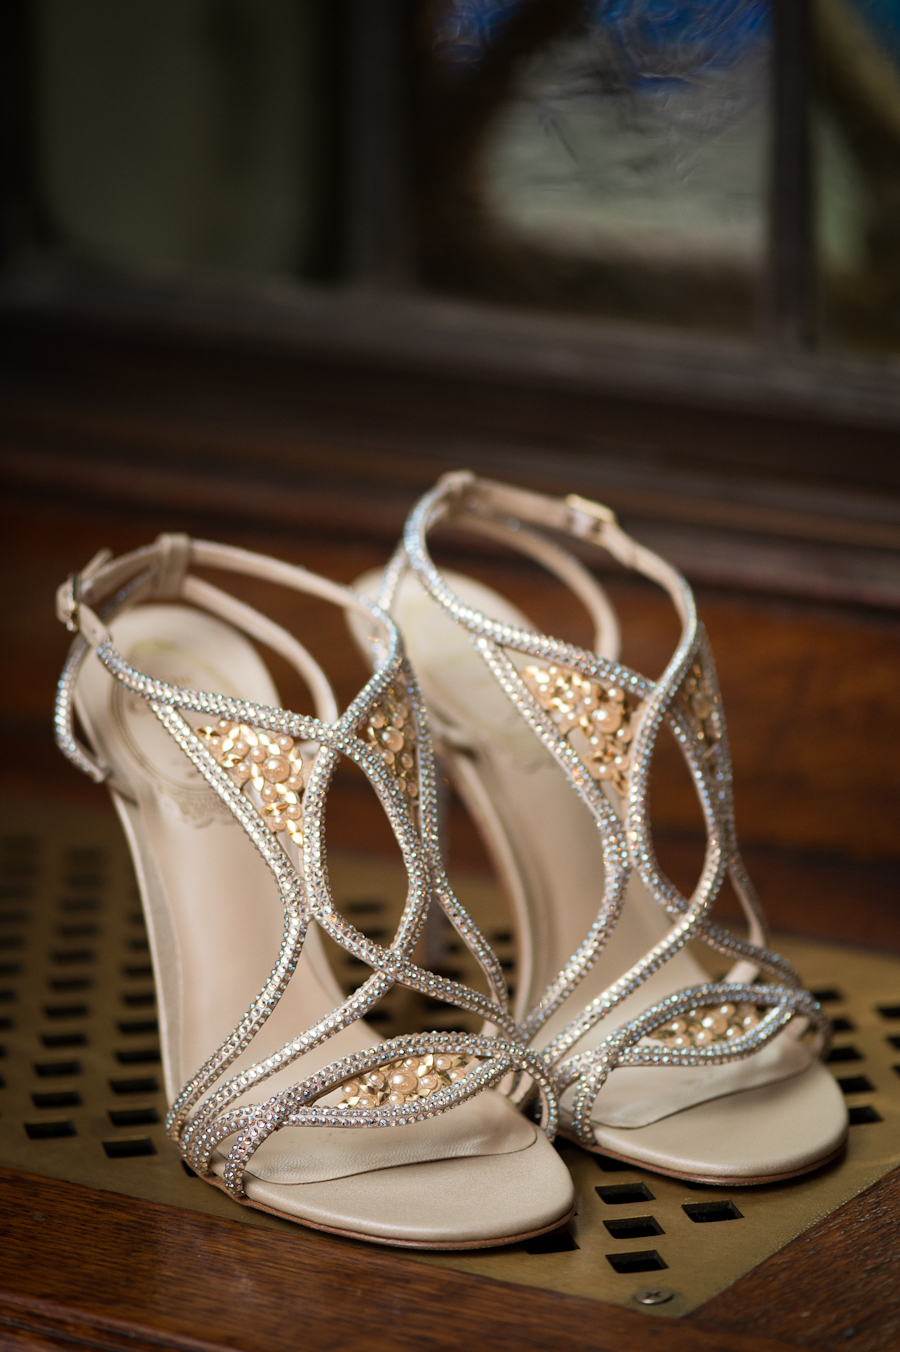 gotham hall brian hatton ang weddings and events-1.jpg